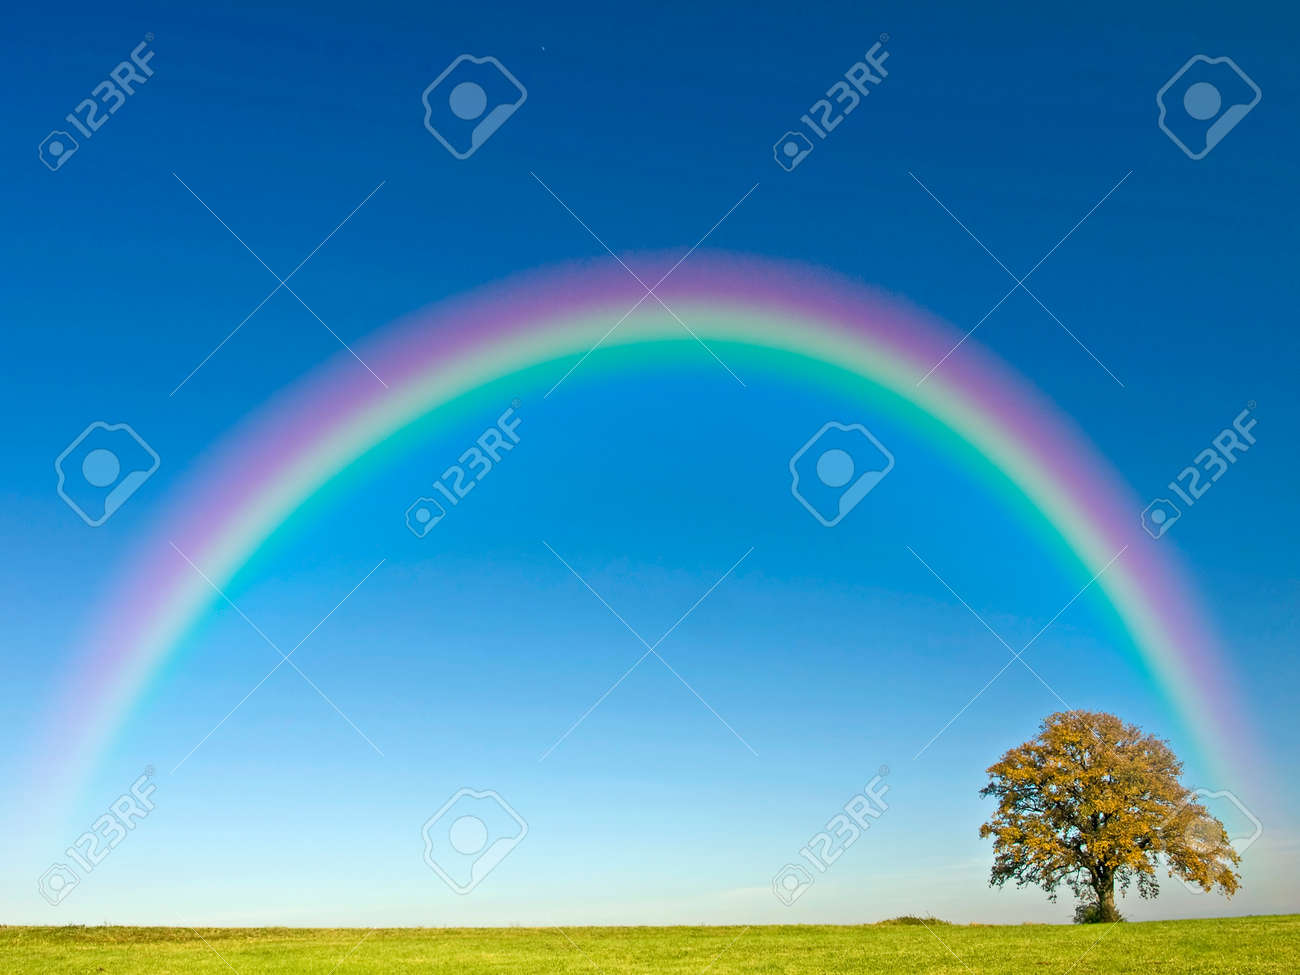 Tree with rainbow - 24719858